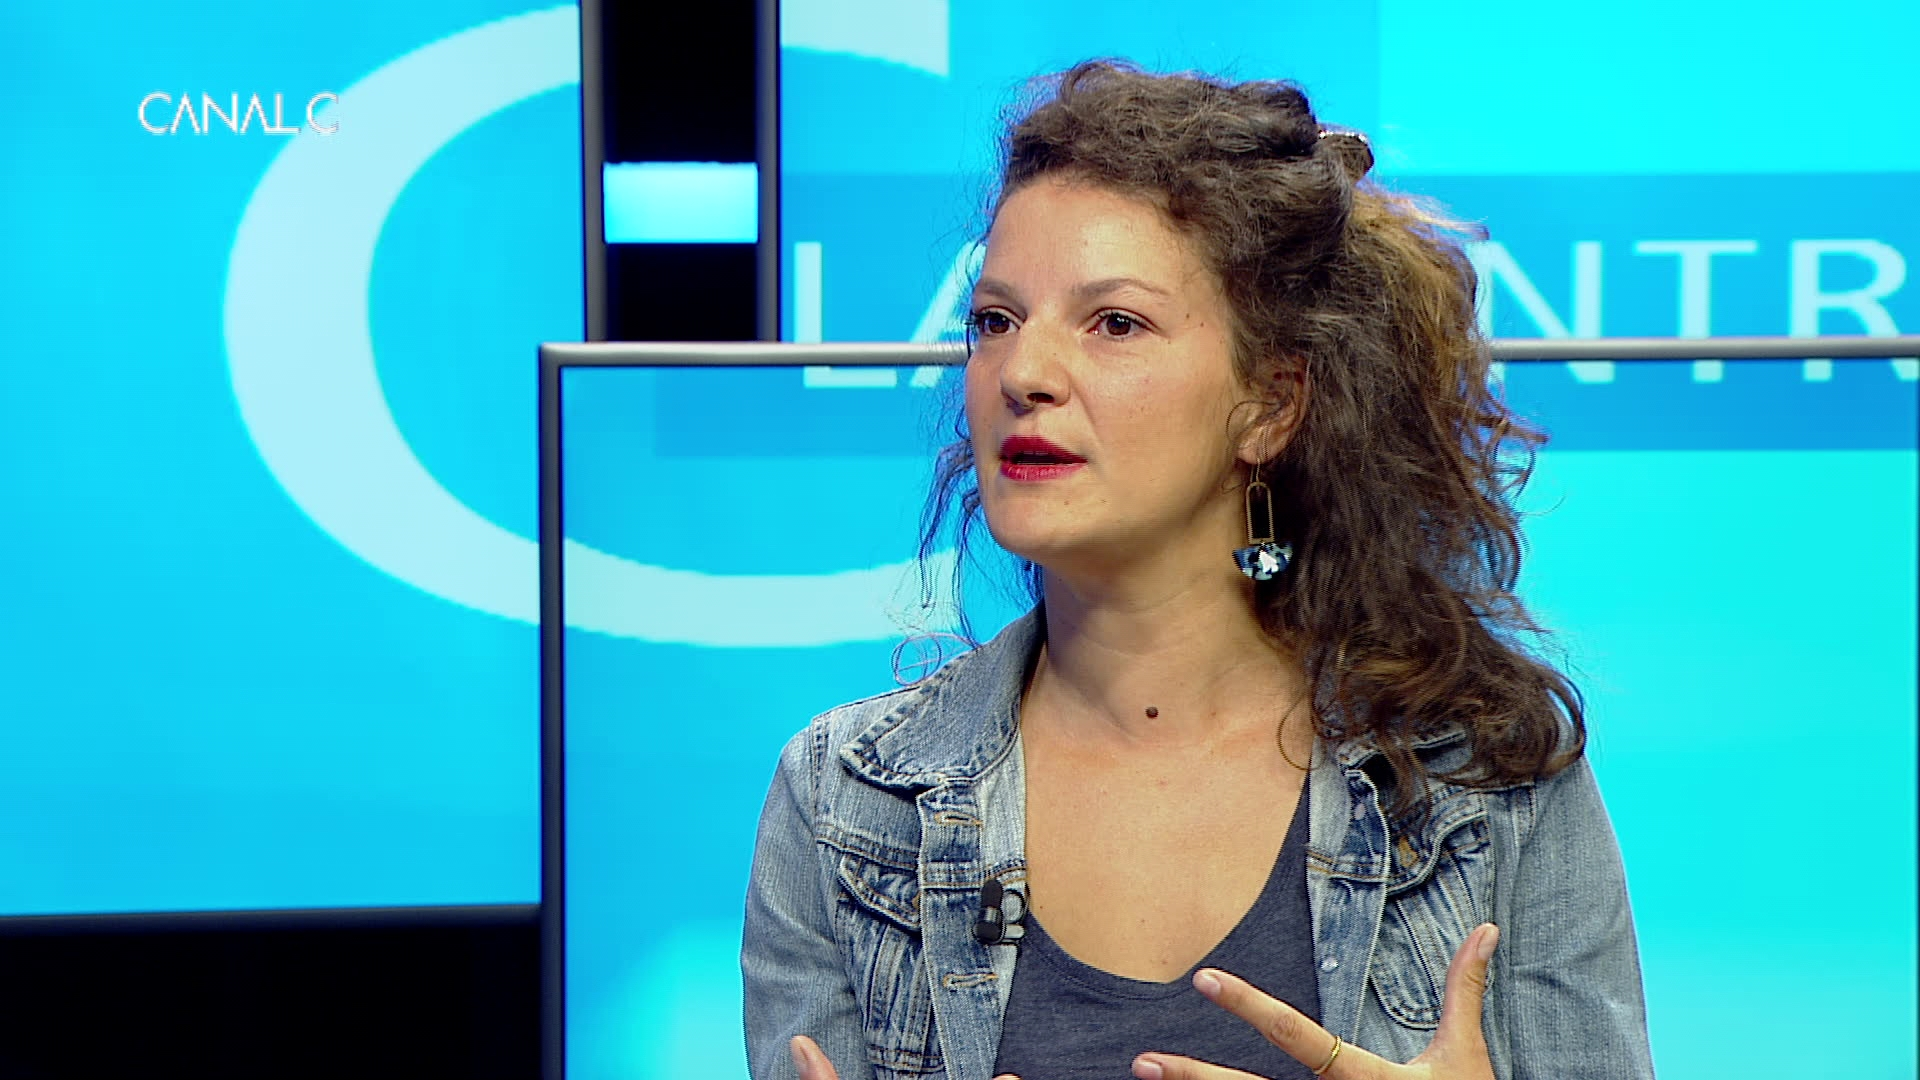 Anne-Sophie Colmant